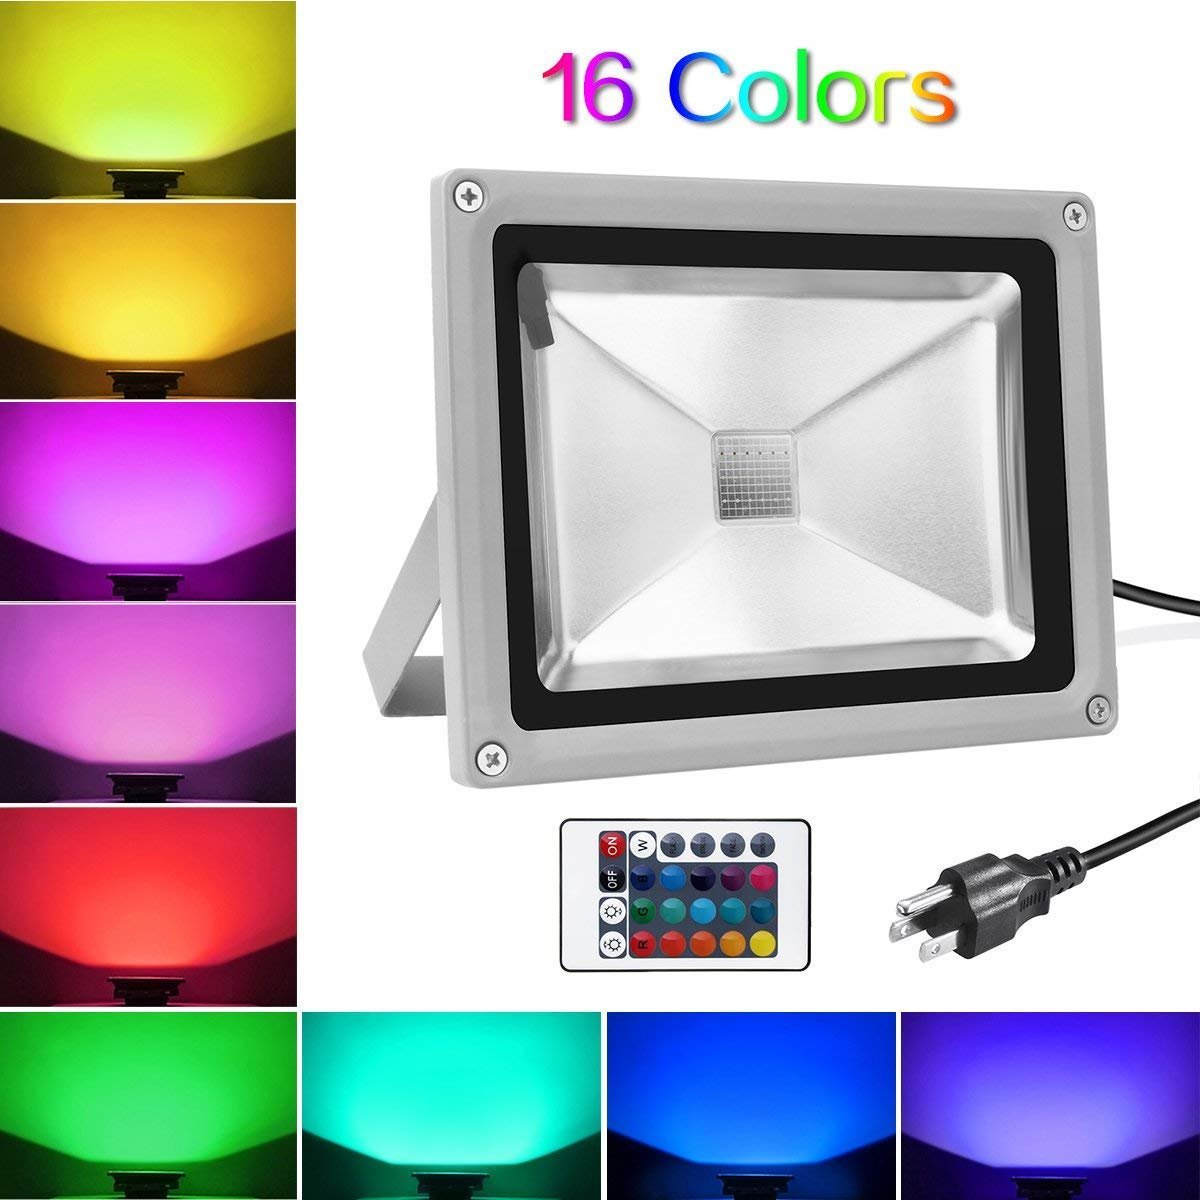 Warmoon 10W Waterproof LED Flood Light with US 3-Plug and Remote, RGB